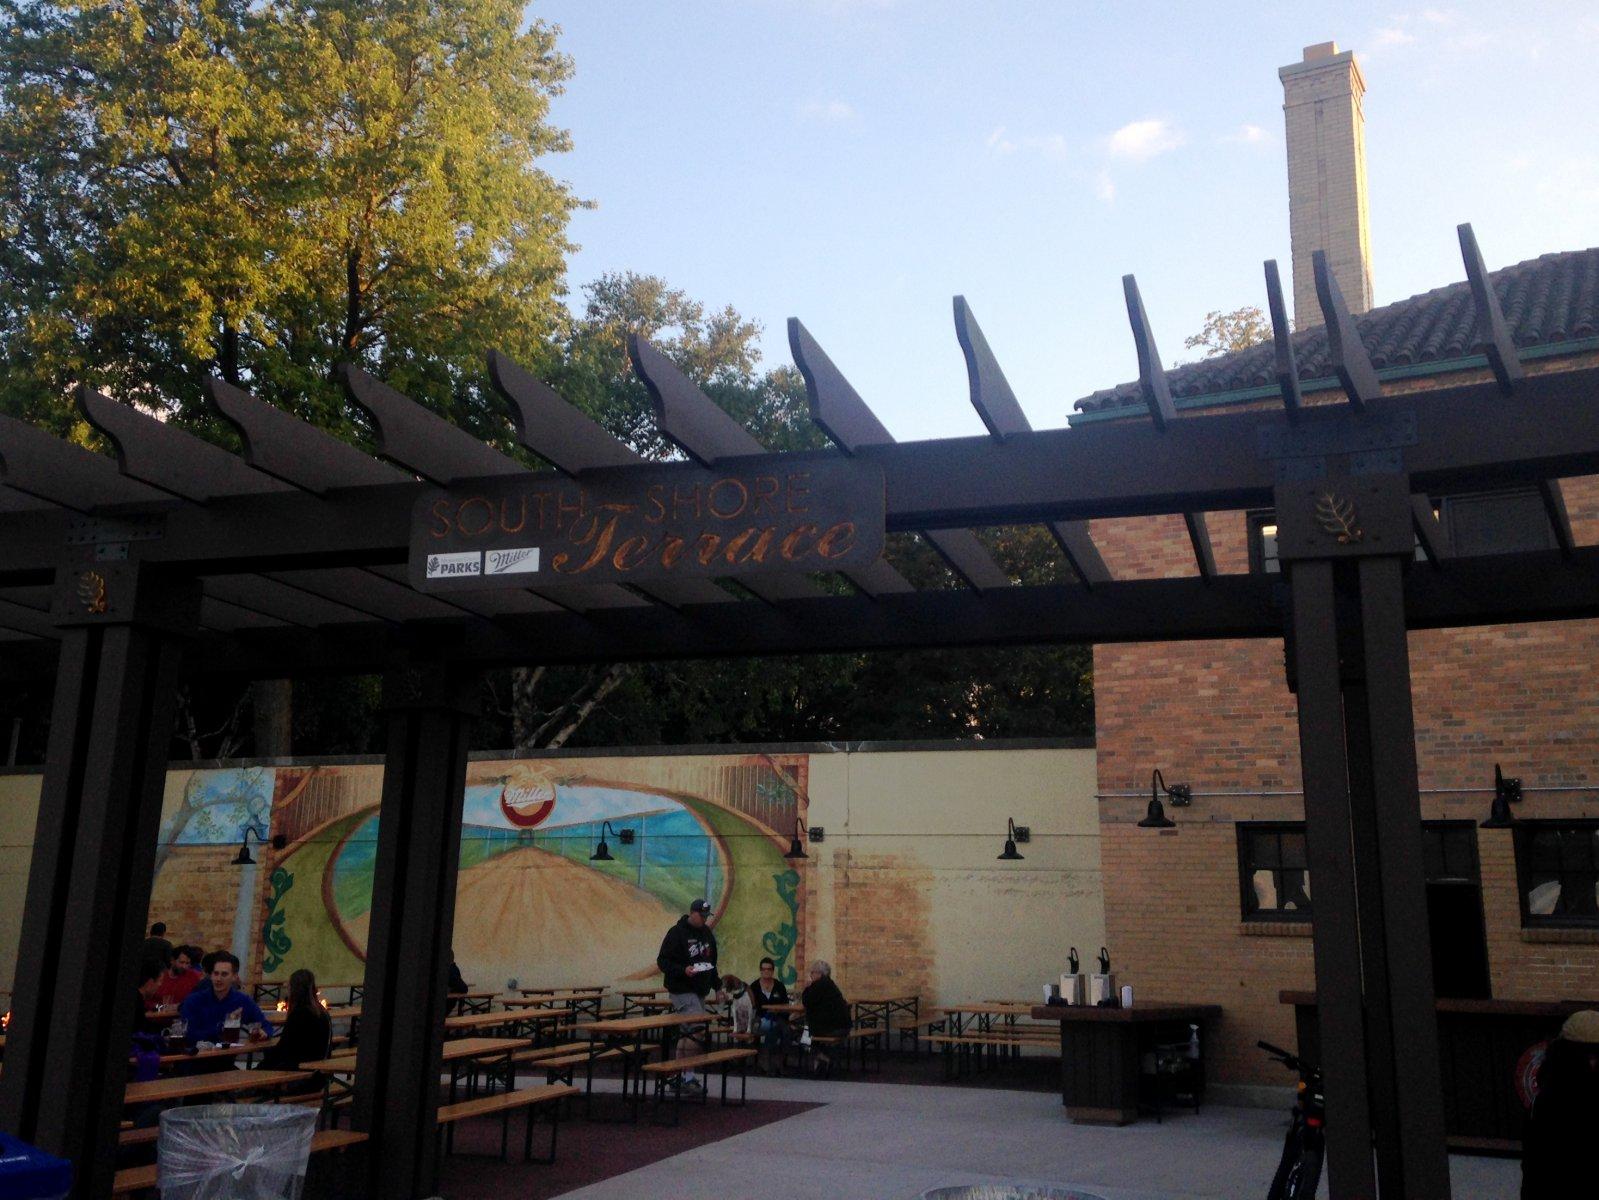 weekly happy hour public beer gardens are great fun urban milwaukee